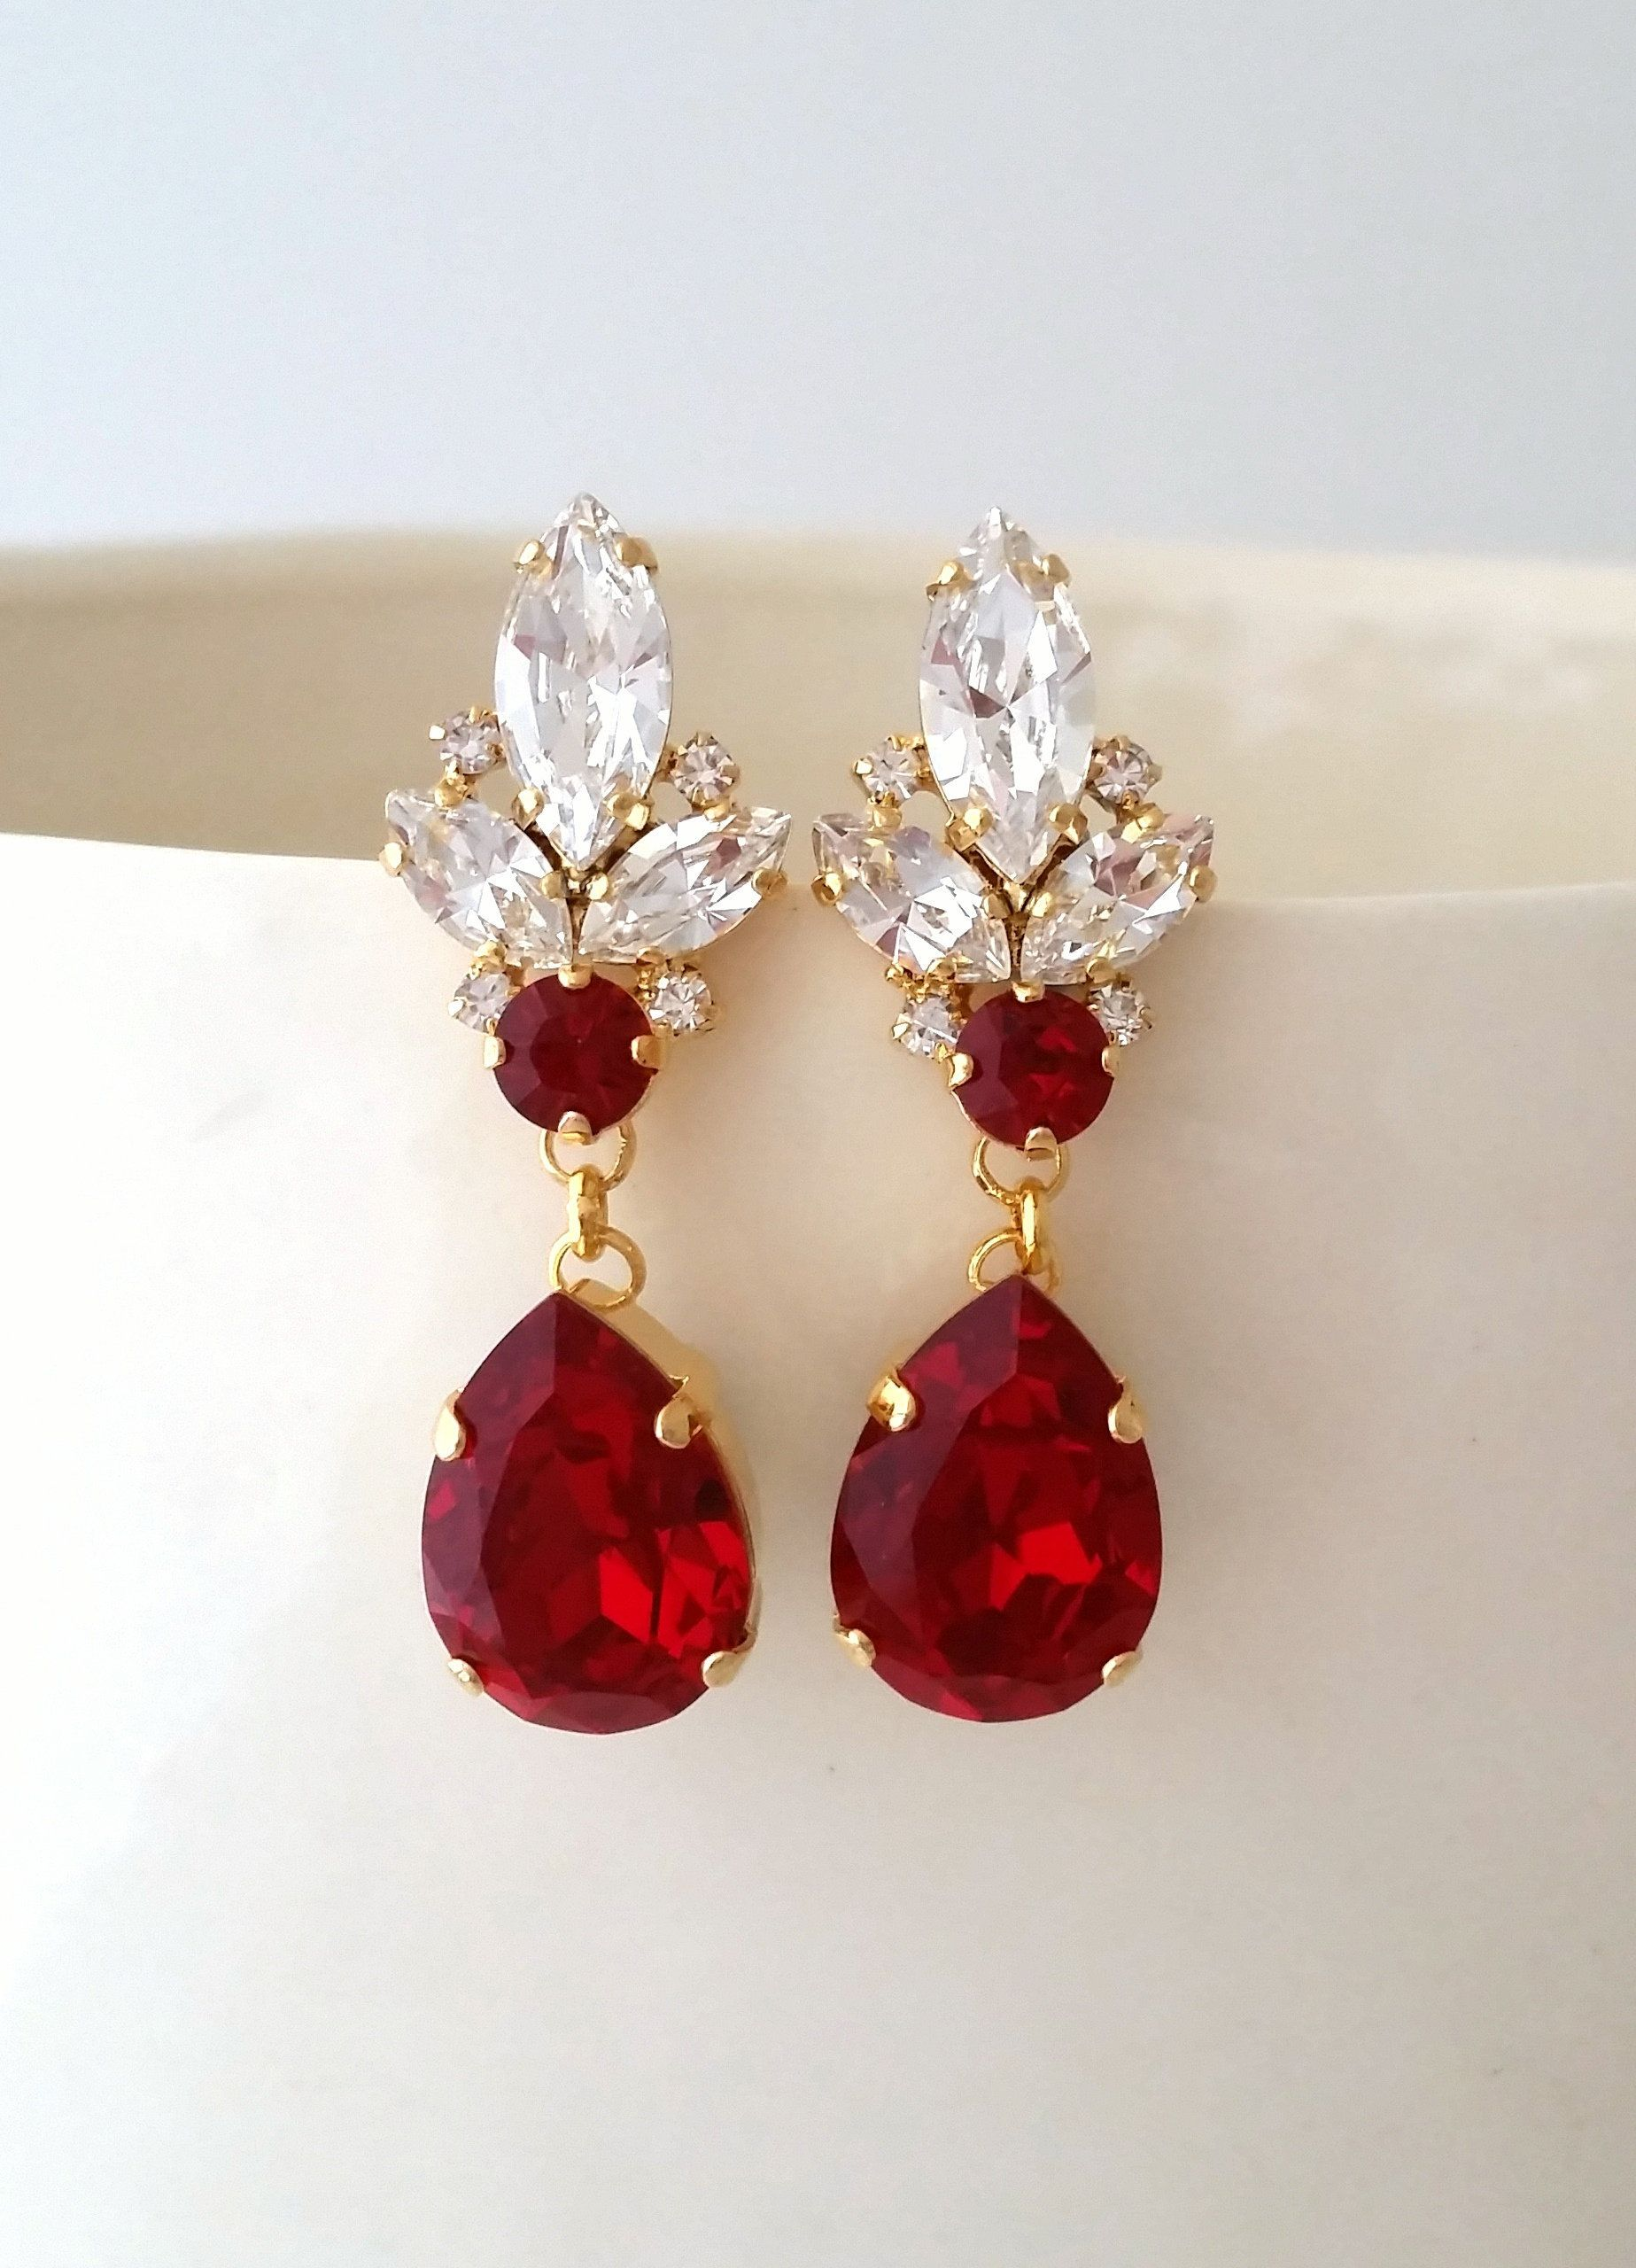 Garnet romantic earrings,elegant earrings,garnet earrings,delicate earrings,gift for her,gothic jewelry,romantic gift,minimalist earrings